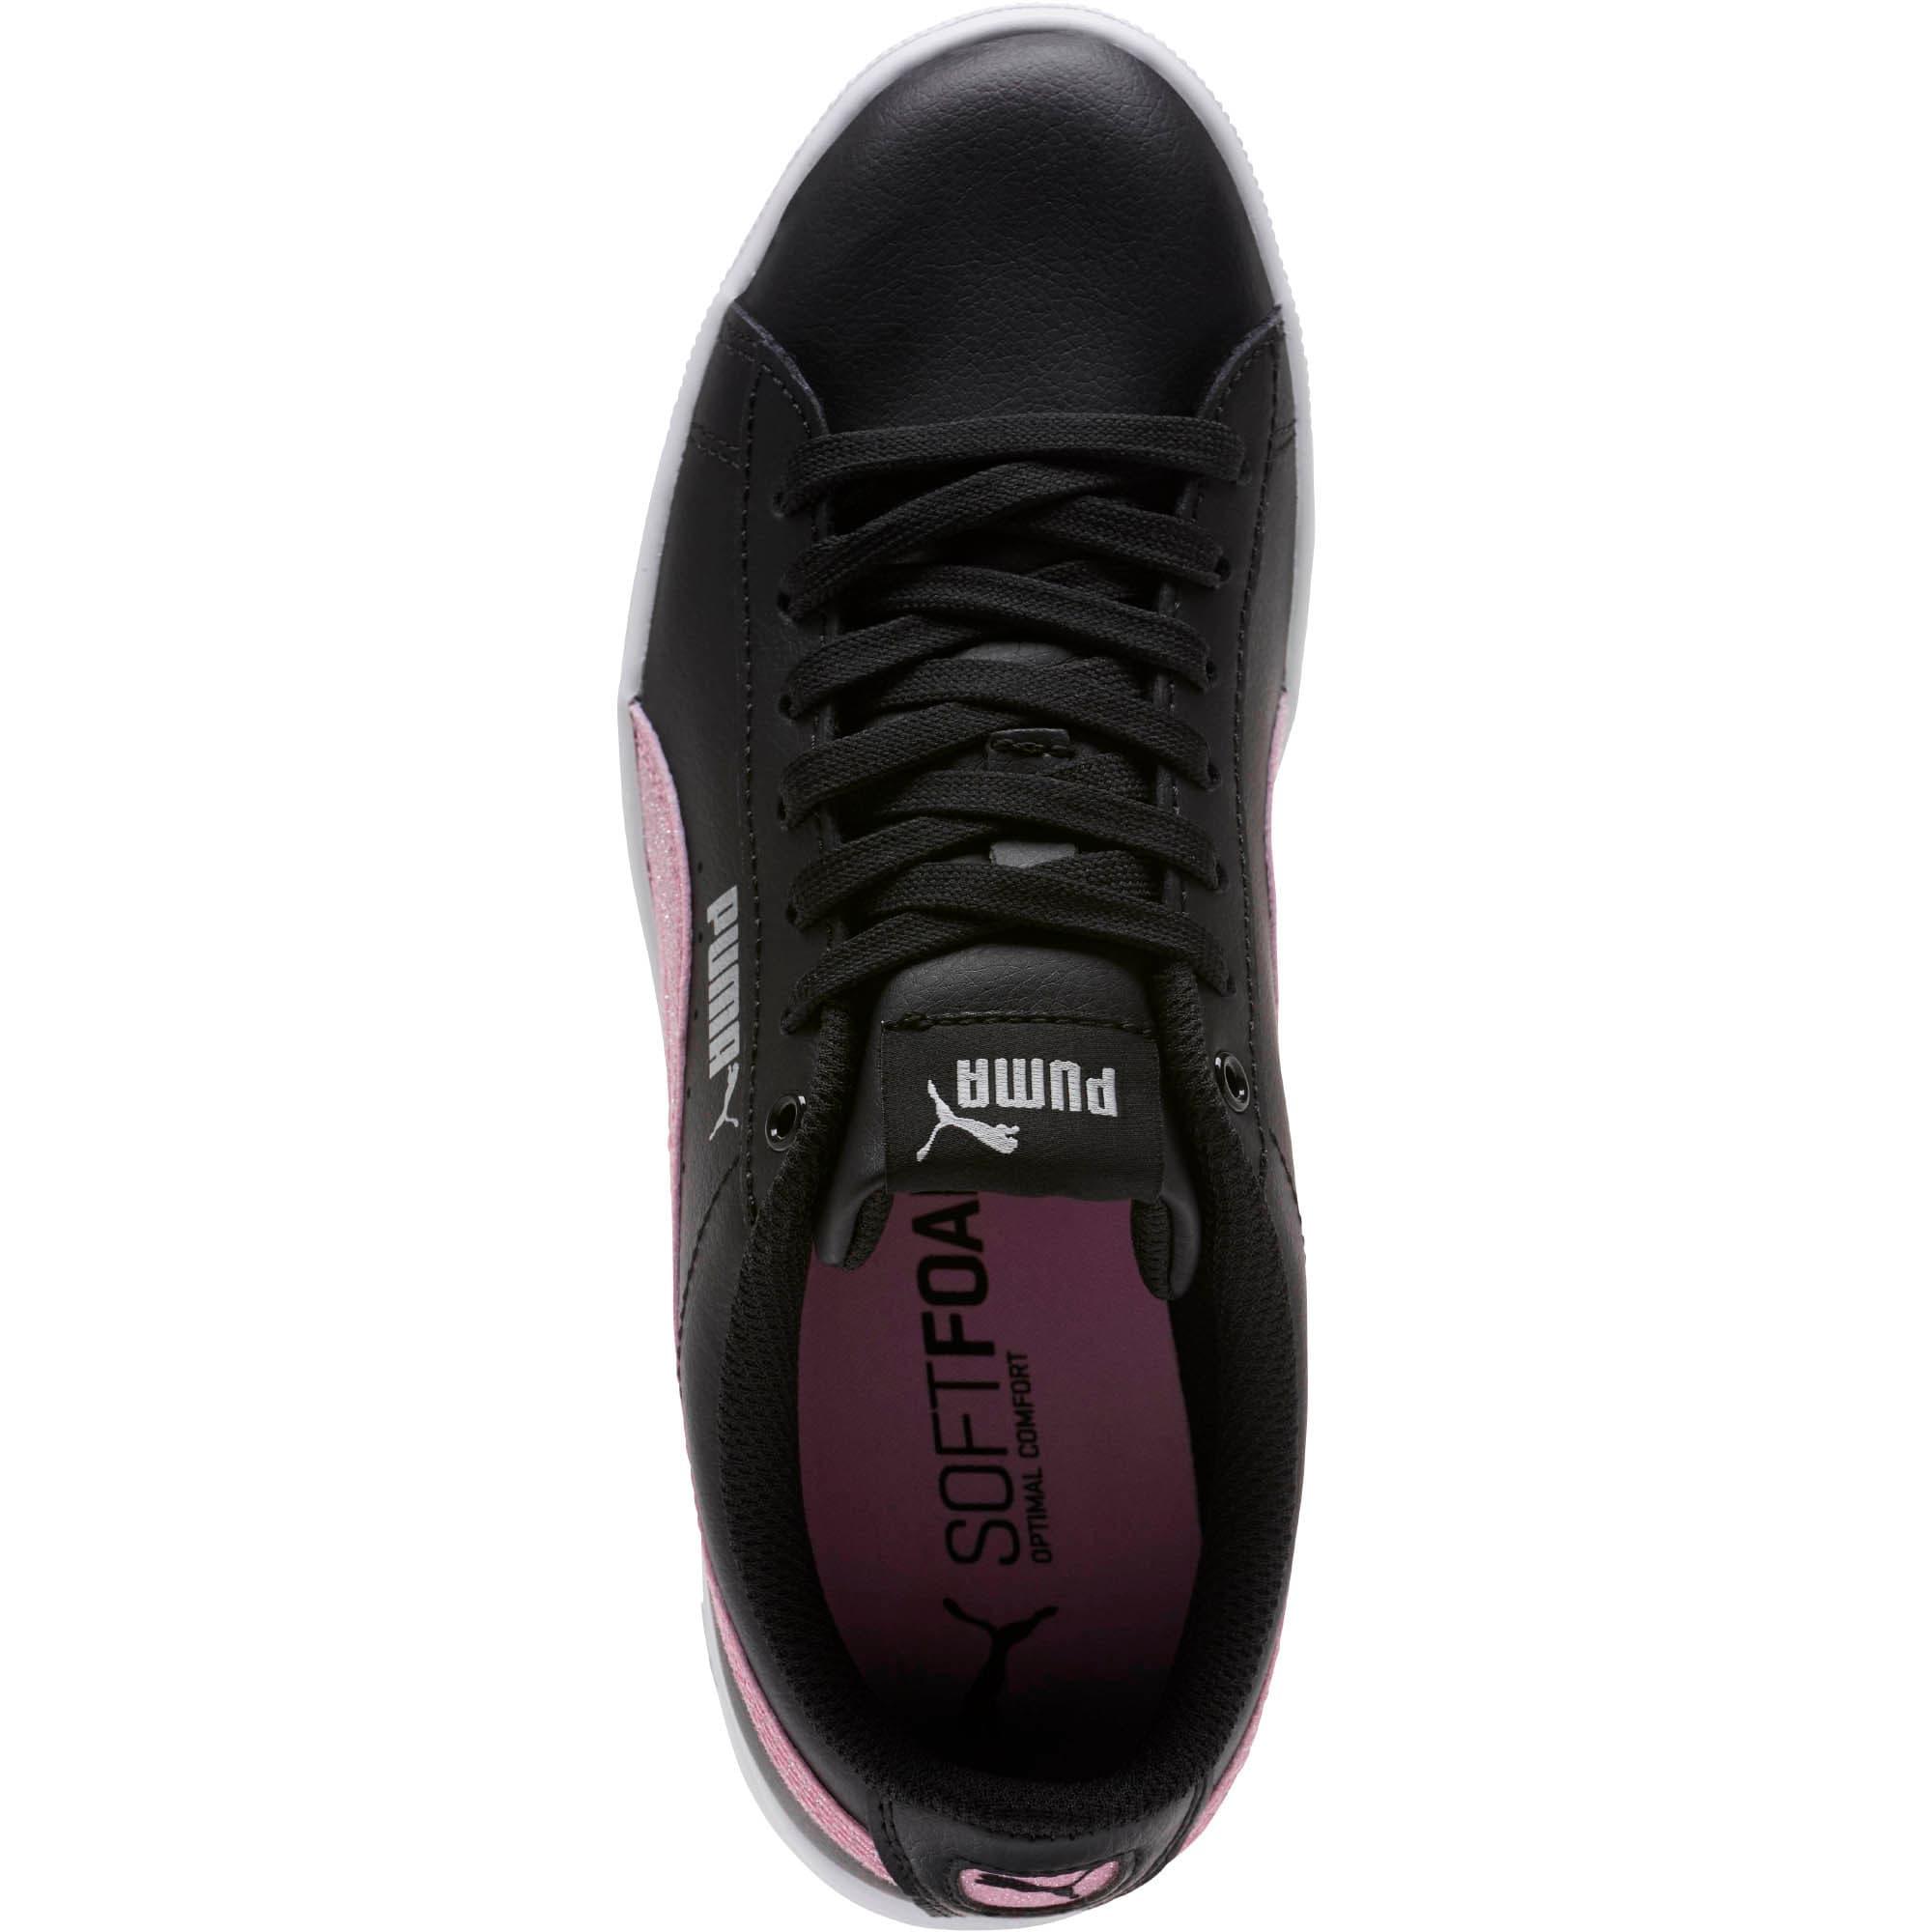 Thumbnail 5 of Puma Vikky Glitz FS Sneakers JR, Black-Orchid-Silver, medium